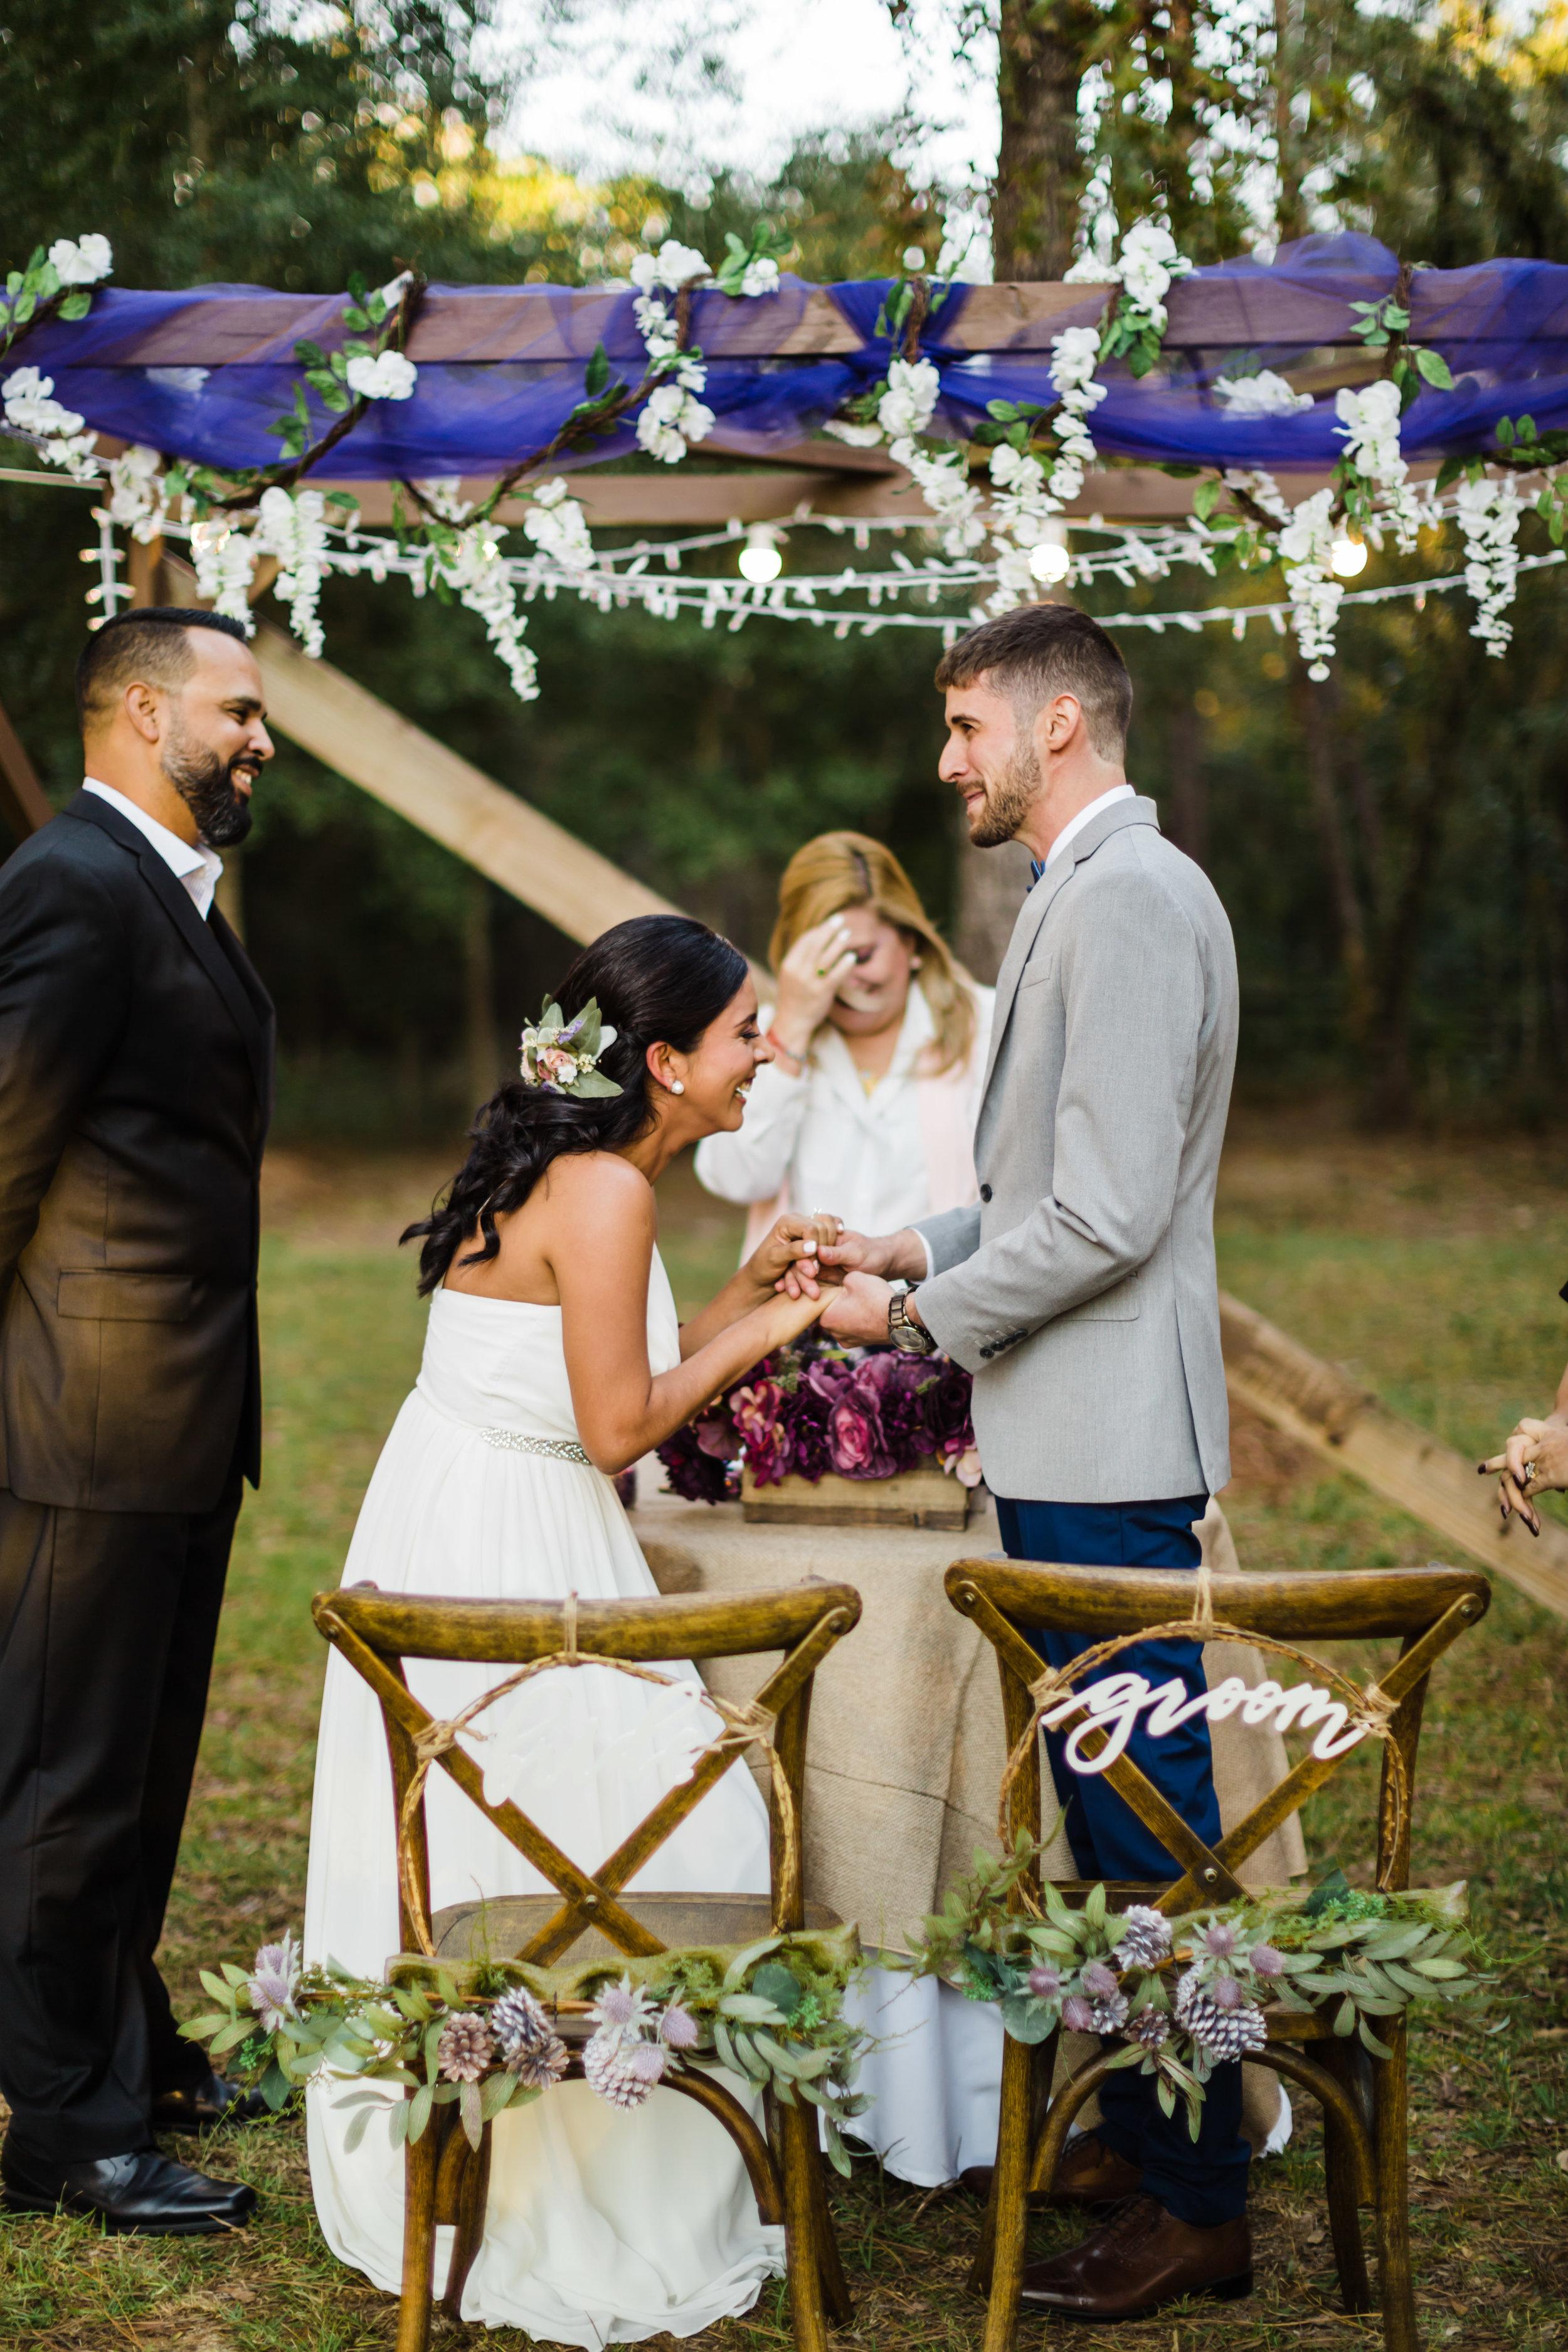 2018.11.03 Jael and Edel Ocala Wedding FINALS (224 of 441).jpg